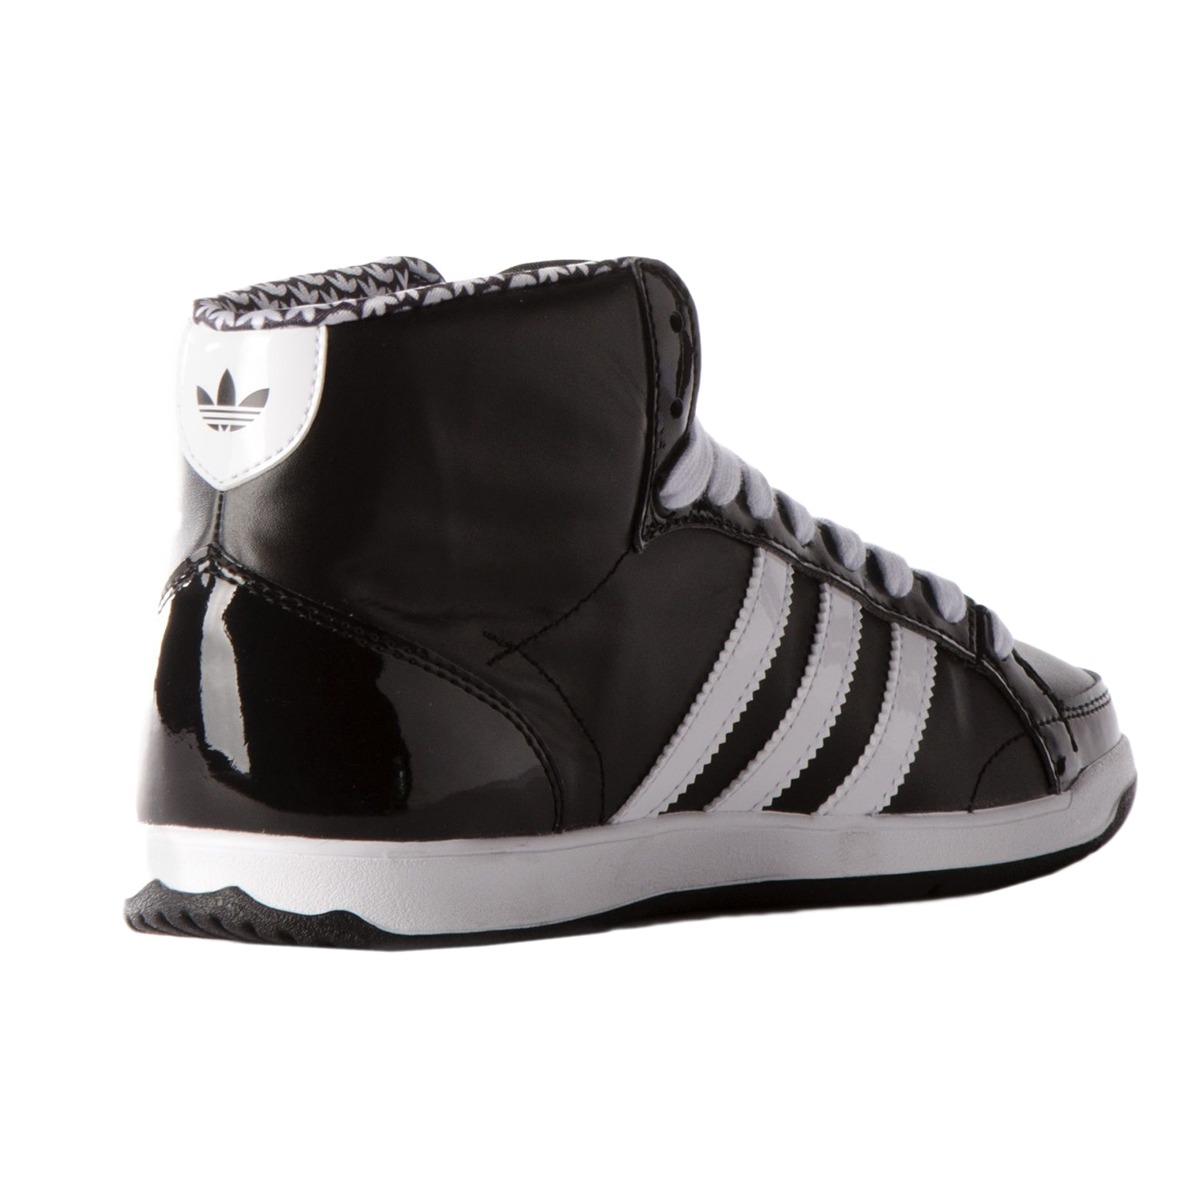 innovative design 5a5ef 3f2b8 botas adidas original adi hoop mid w sportline. Cargando zoom.